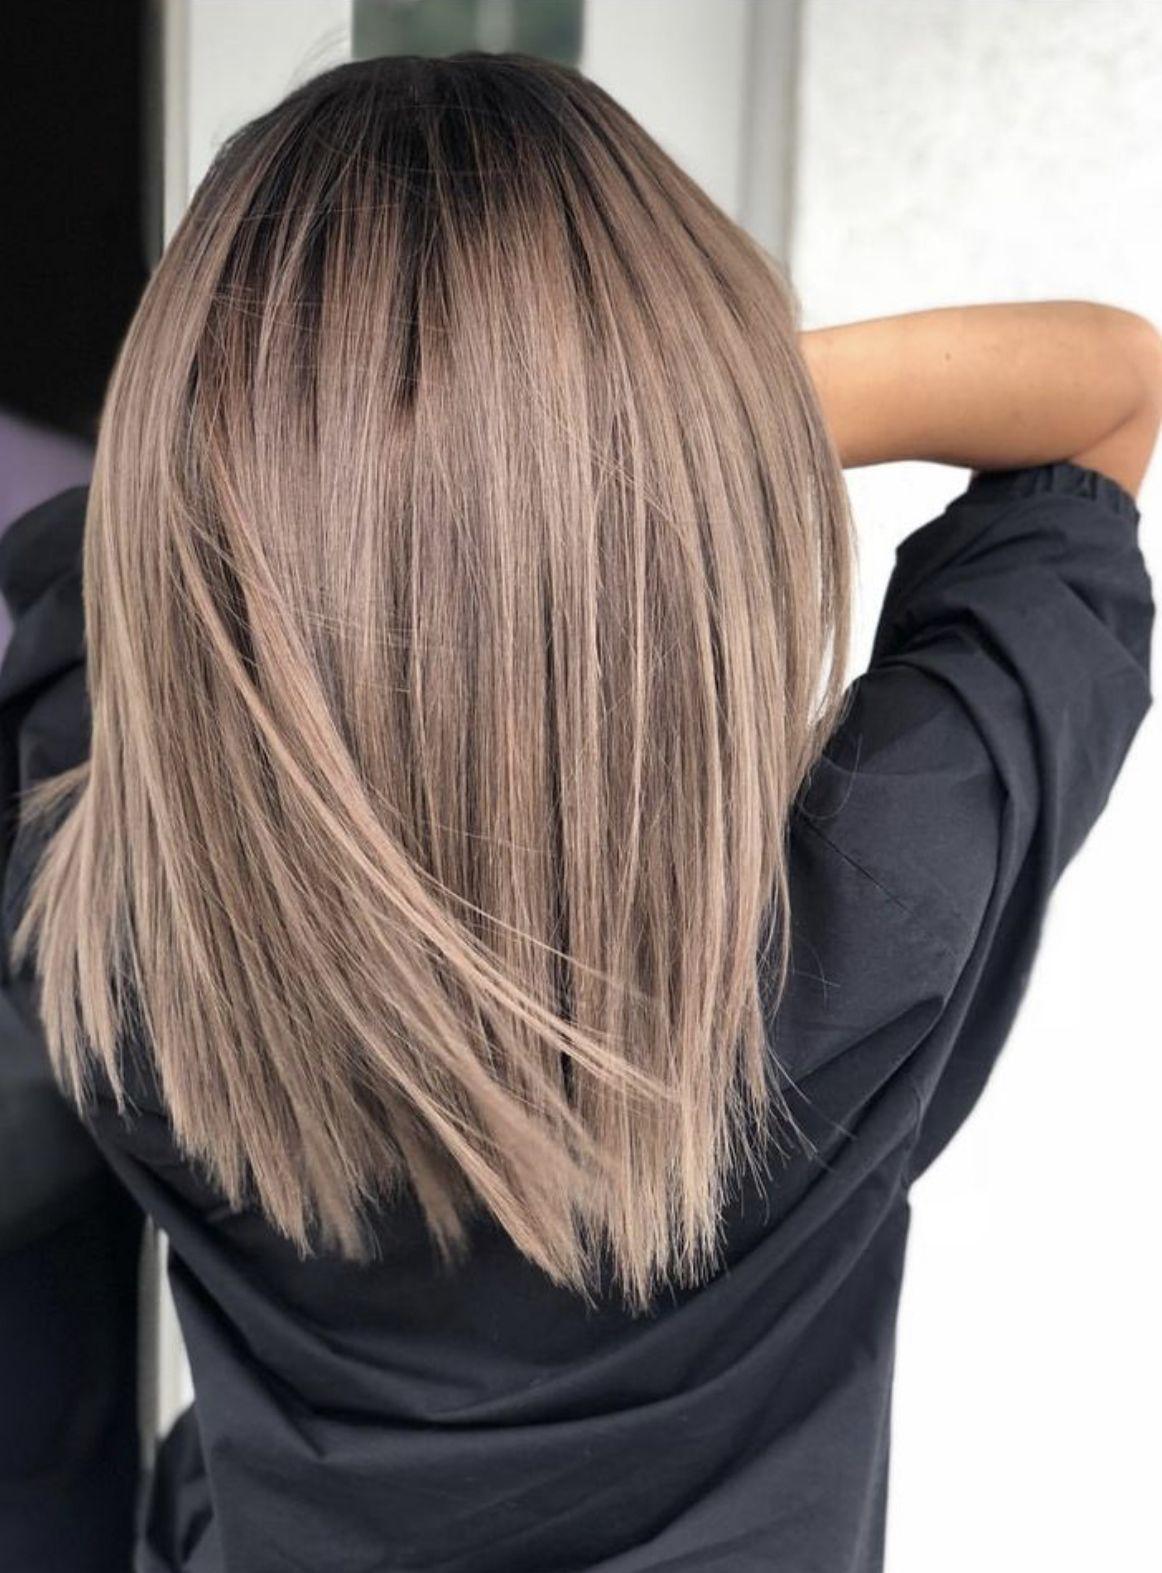 Pin By Lena Kromer On Frisur Trendy Hair Color Straight Bob Haircut Brunette Hair Color